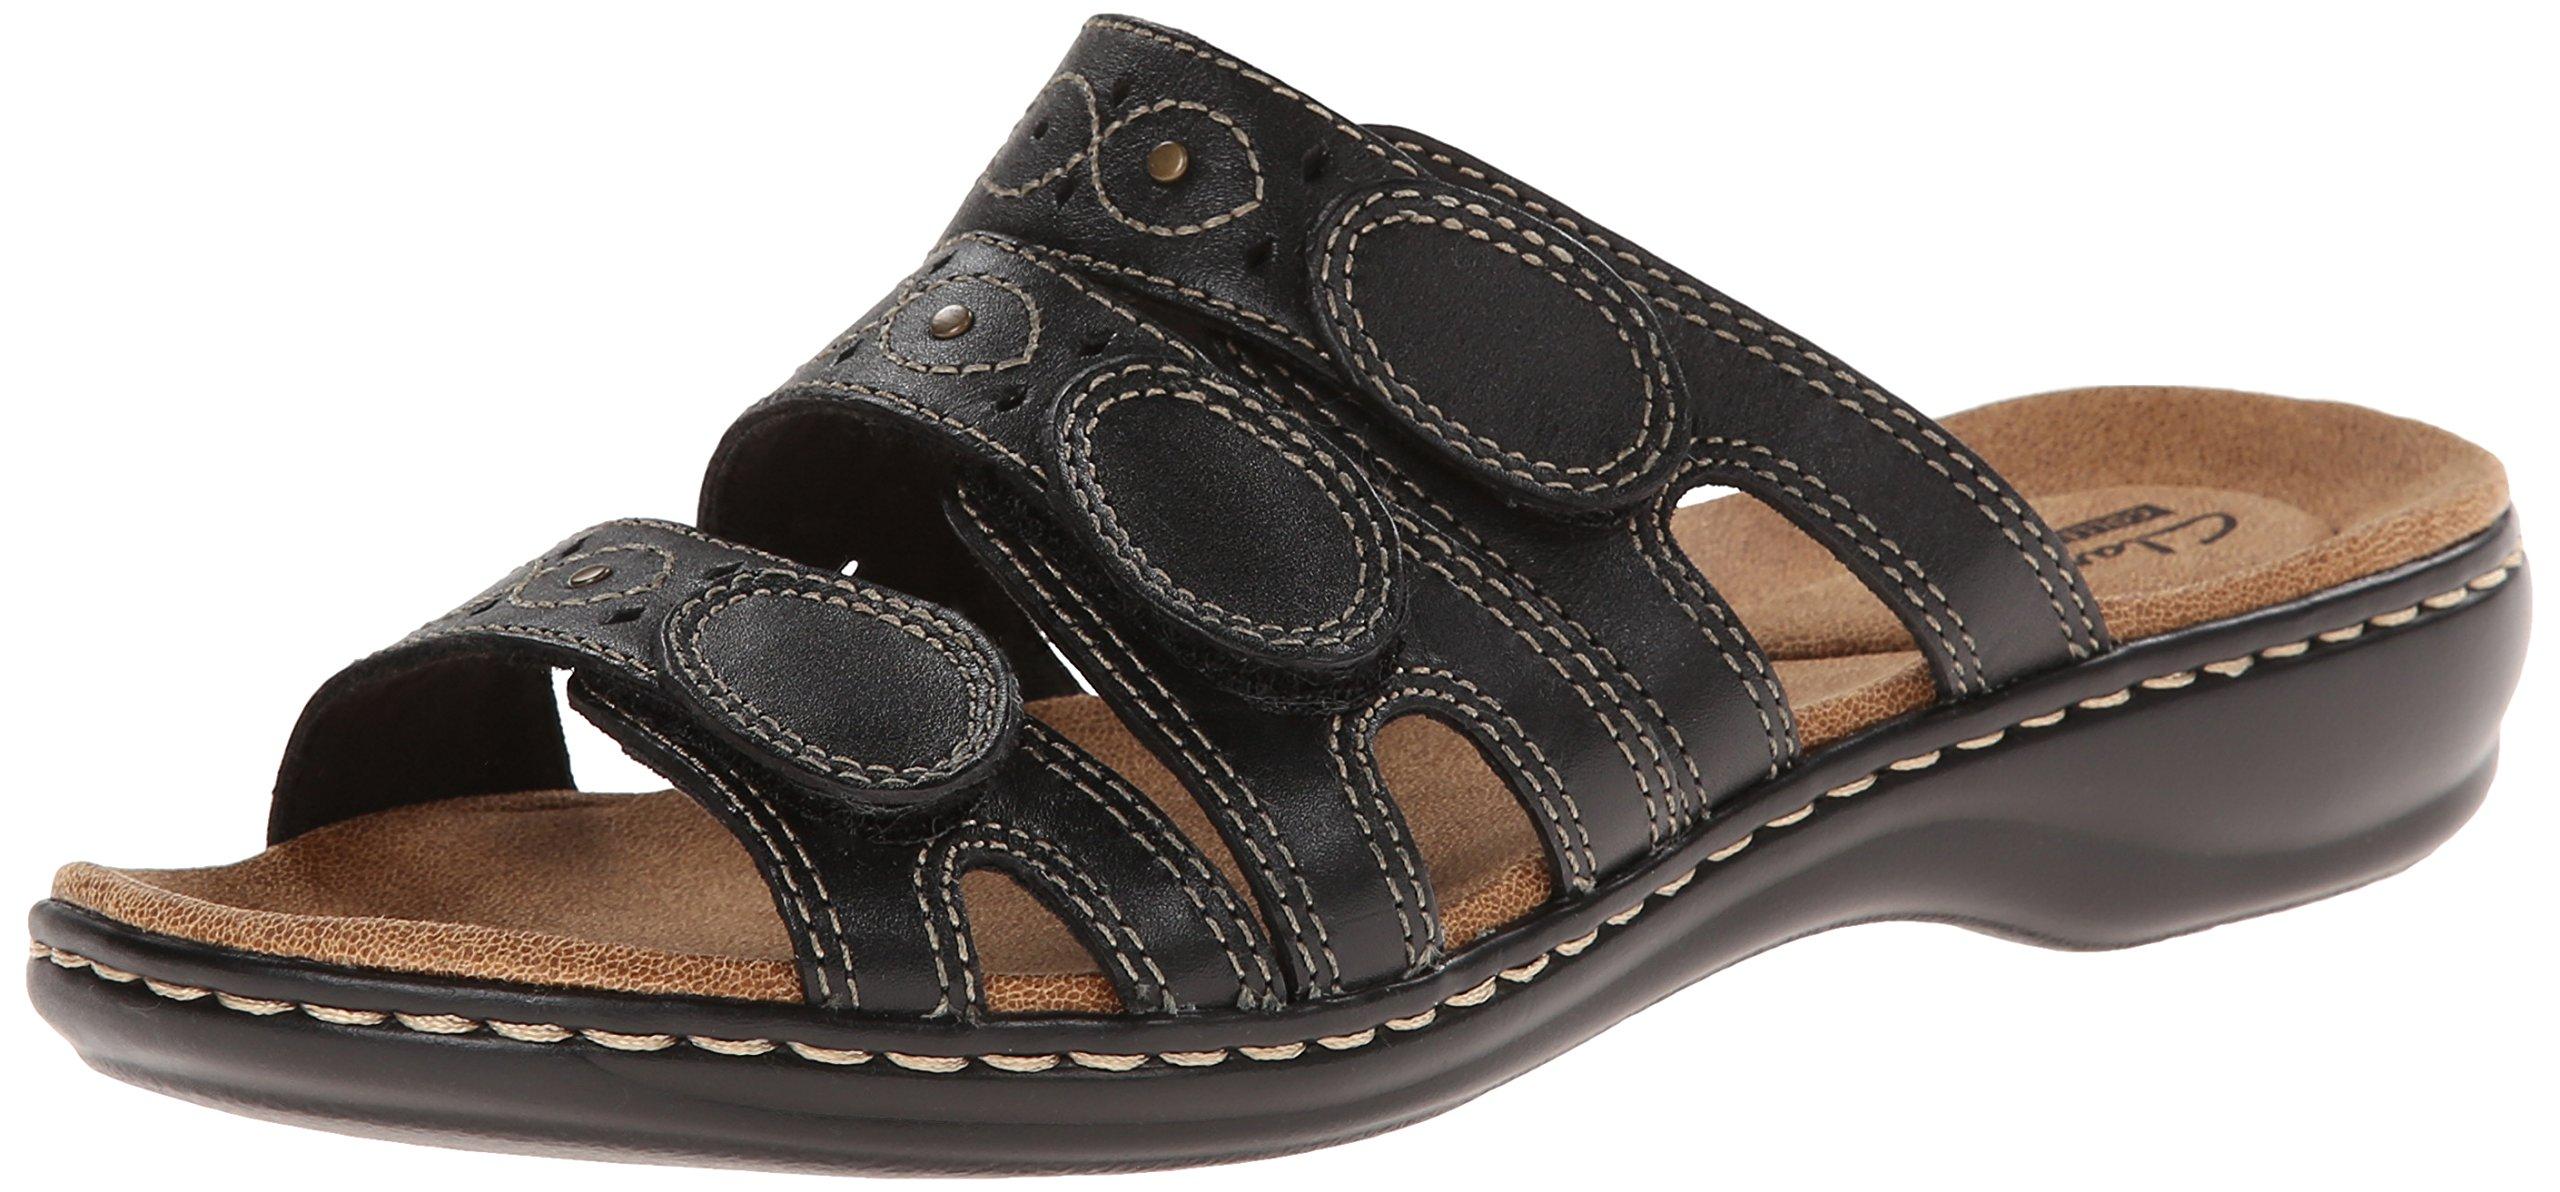 CLARKS Women's Leisa Cacti Slide Sandal, Black Leather, 8 M US by CLARKS